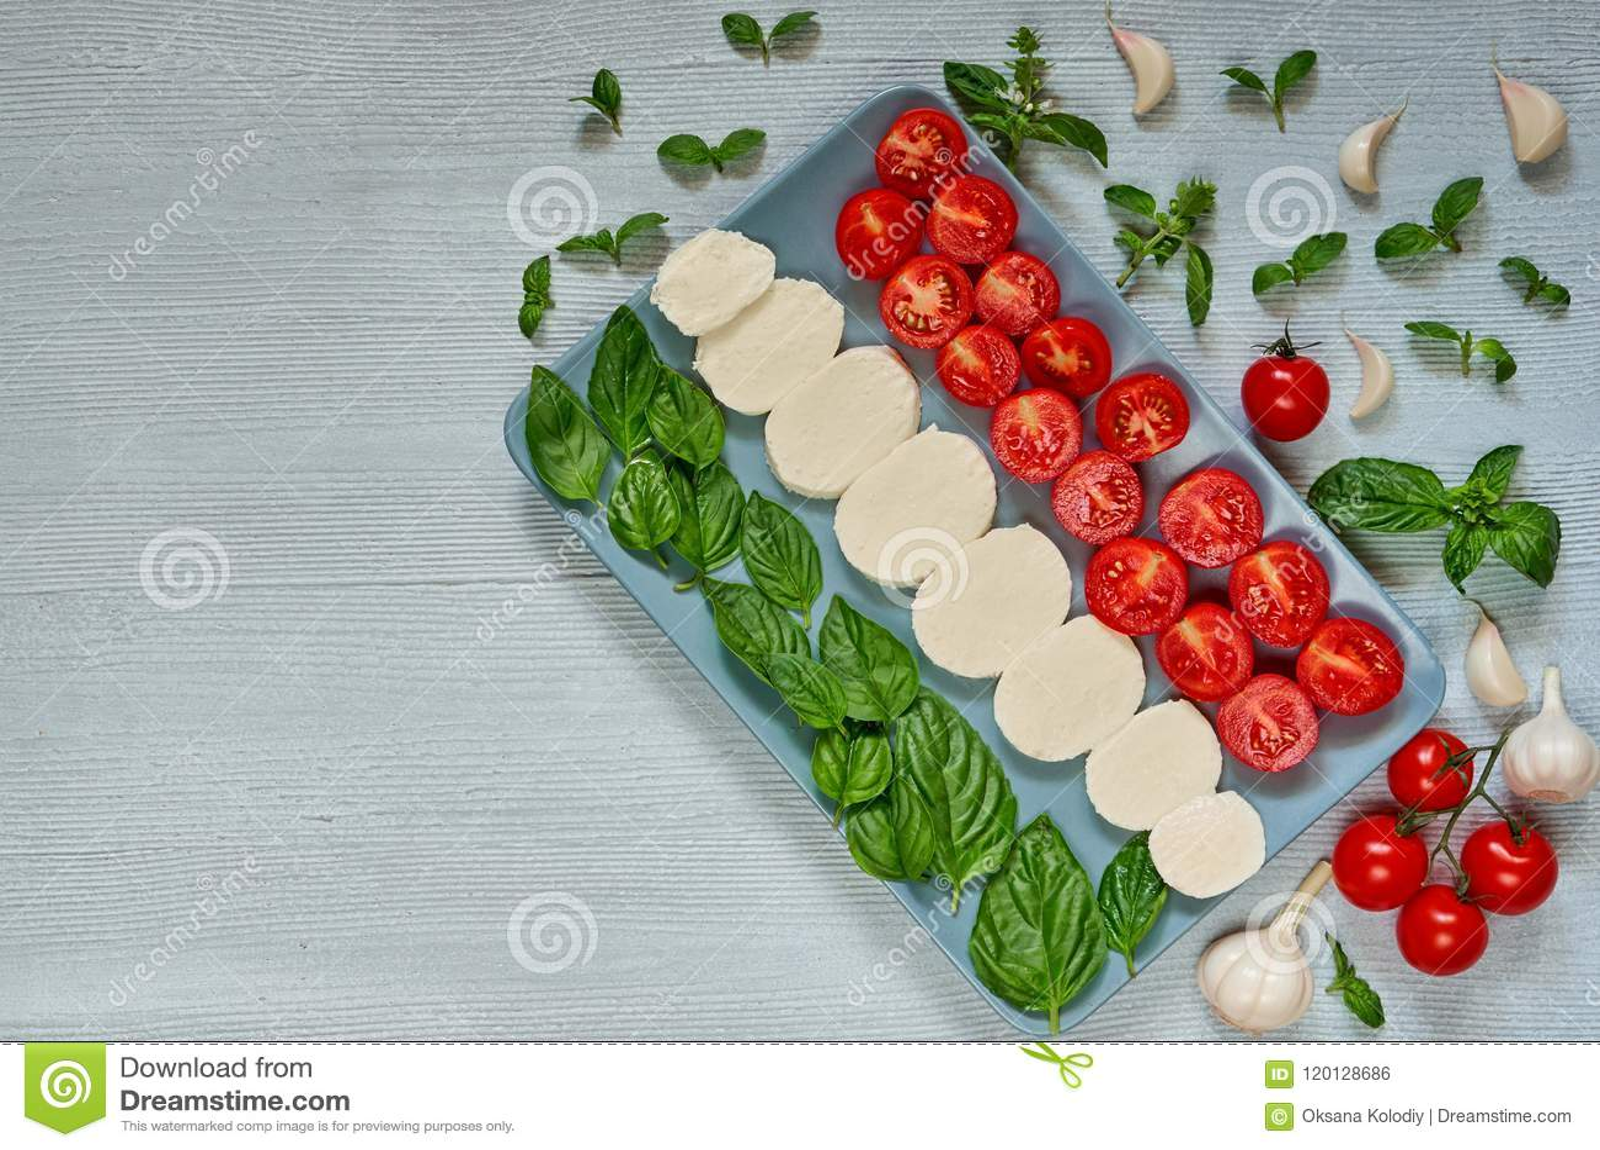 Caprese salad with organic ingredients: mozzarella cheese, cherry tomatoes, fresh basil leaves, garlic. Traditional italian food